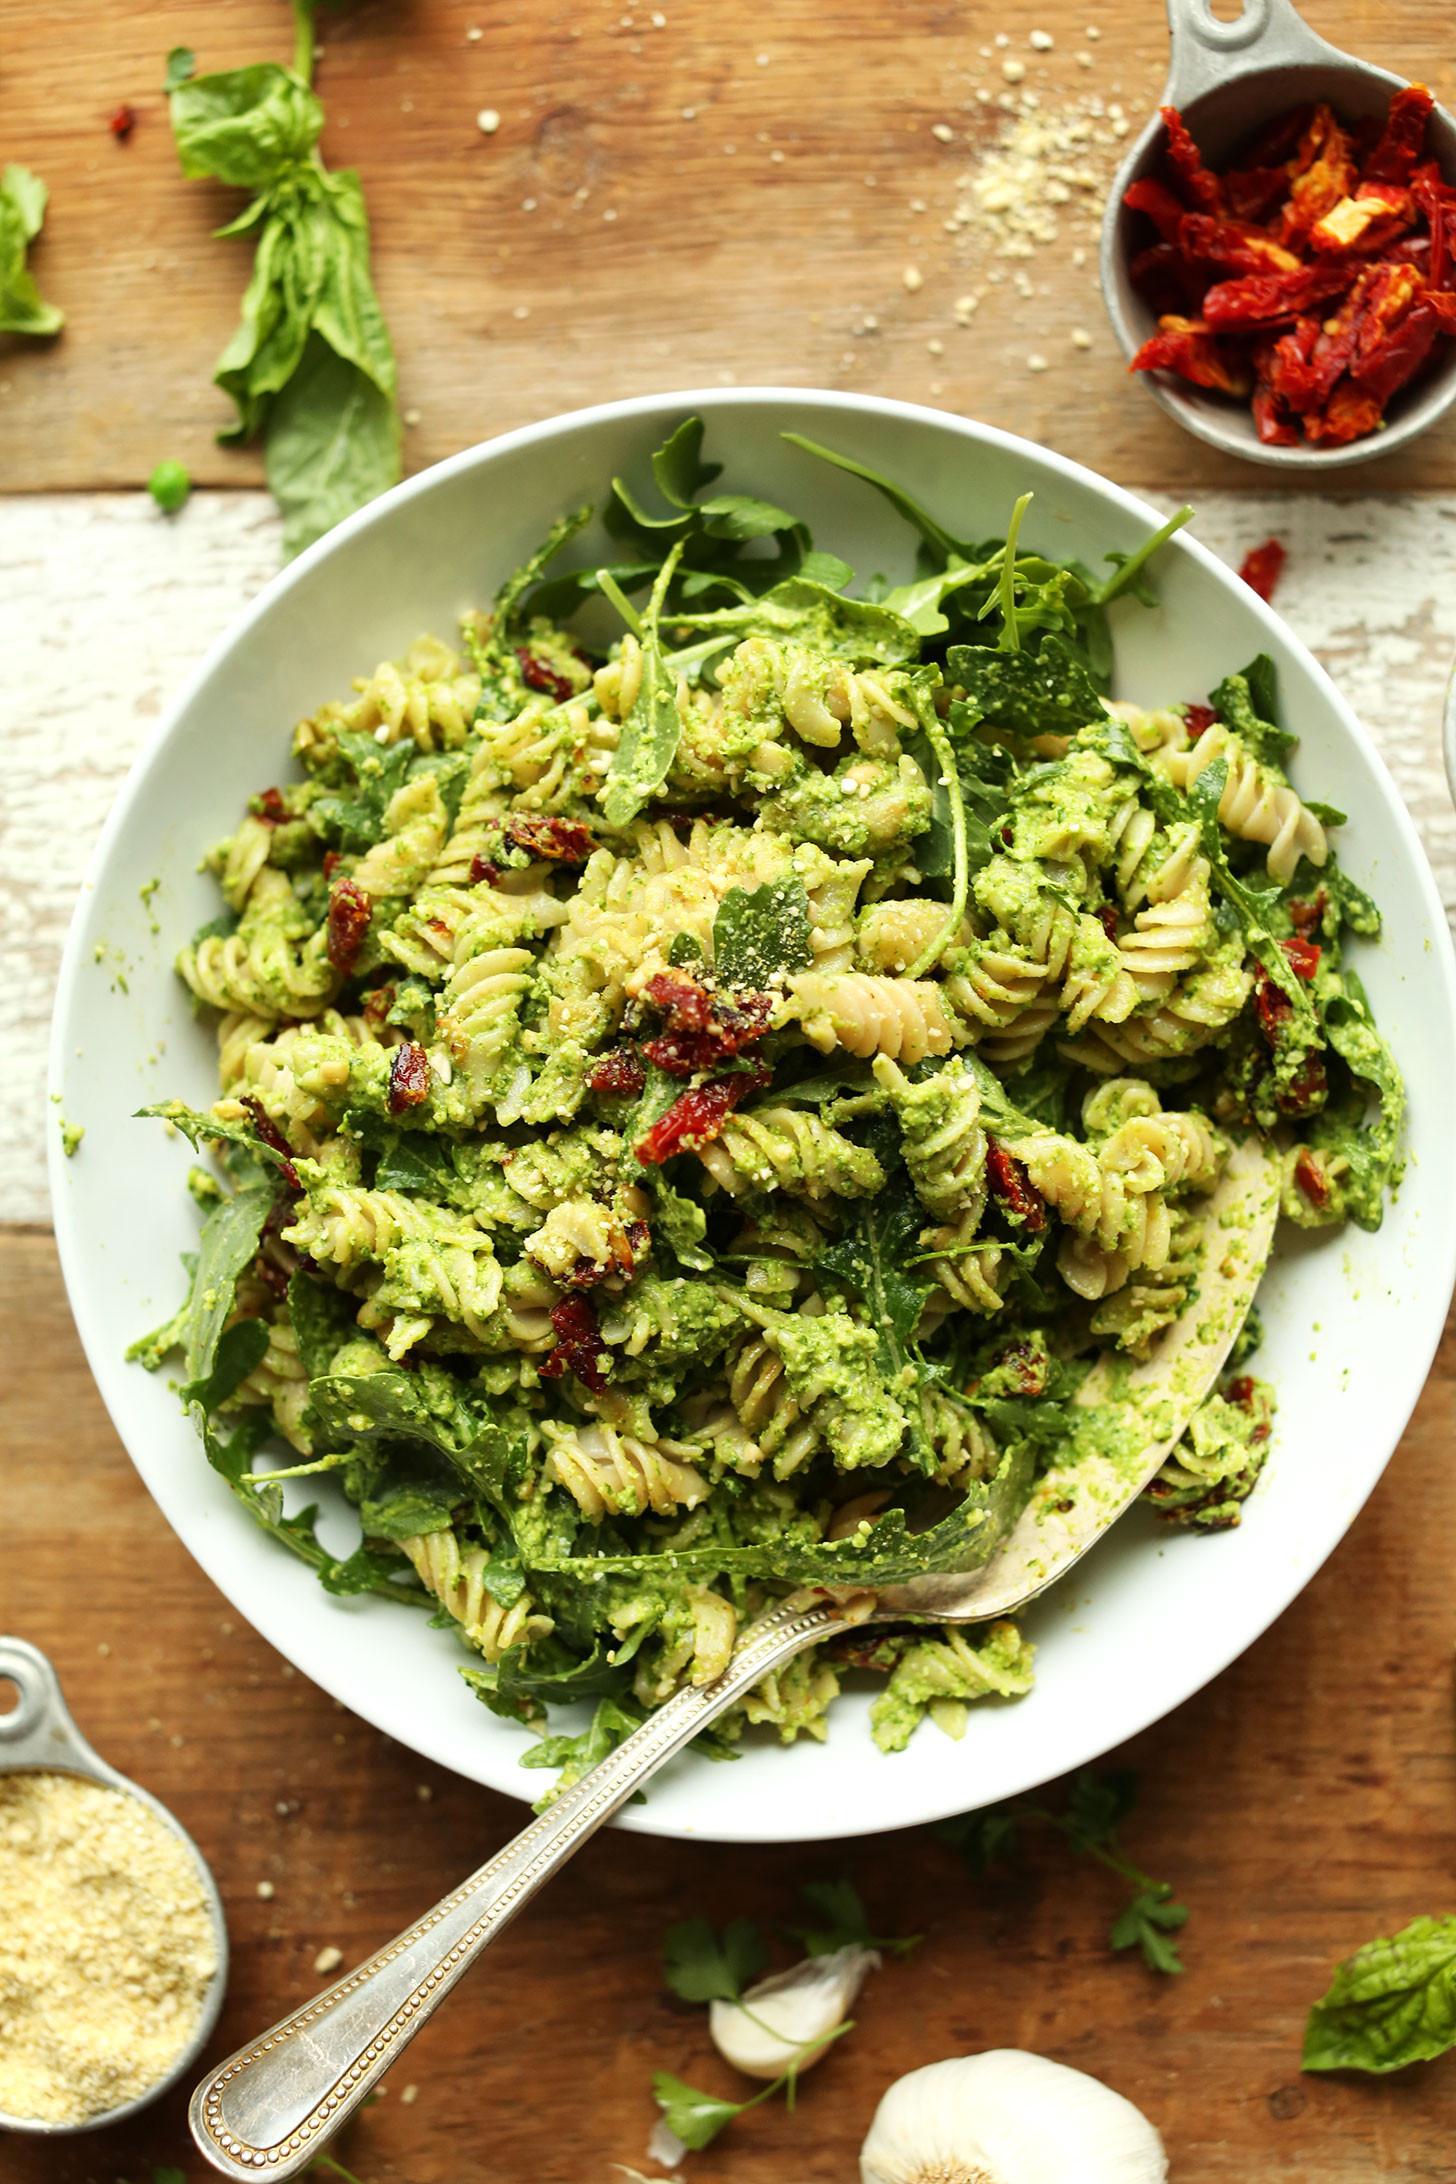 Healthy Vegan Pasta Recipes  Pea Pesto Pasta with Sun Dried Tomatoes